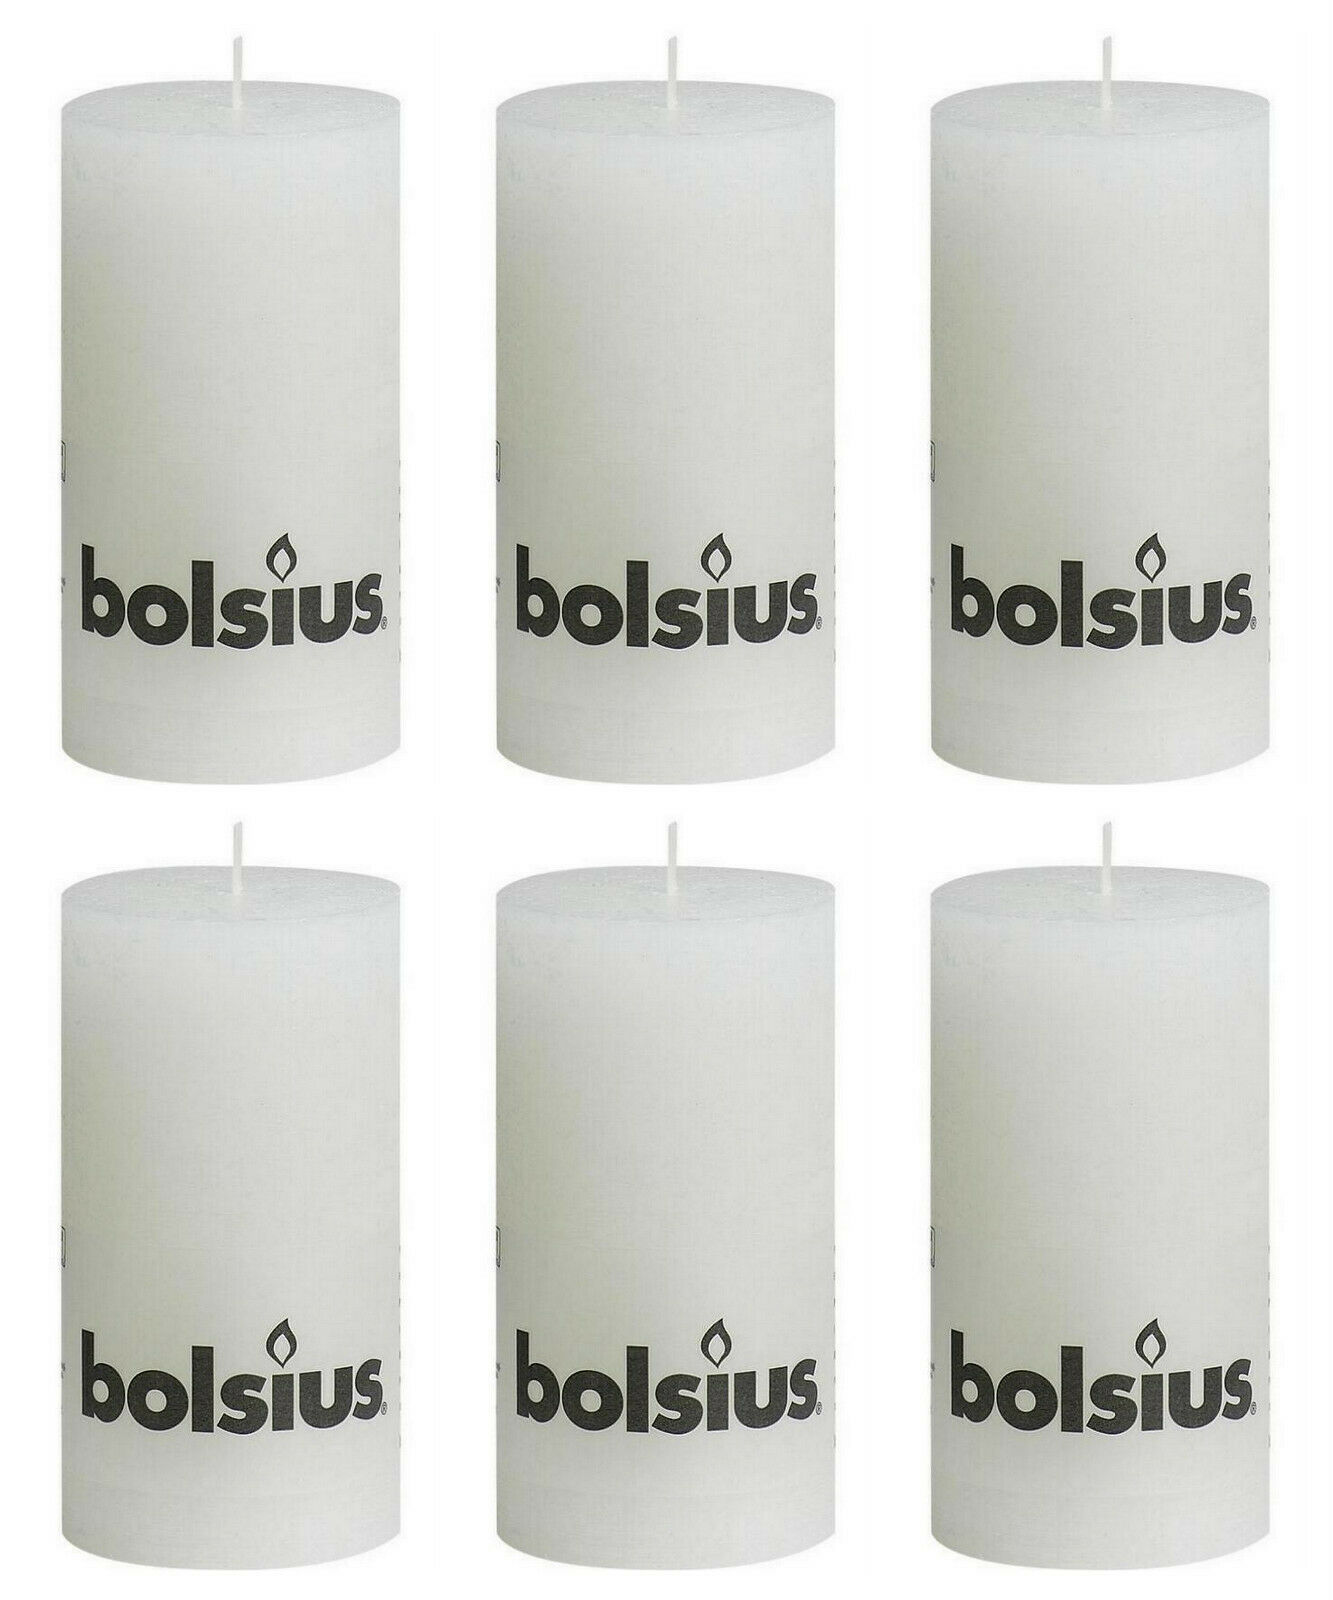 6 Stück Bolsius Rustik Stumpenkerzen 130x68 mm Rustic Stumpen Kerzen Weiß